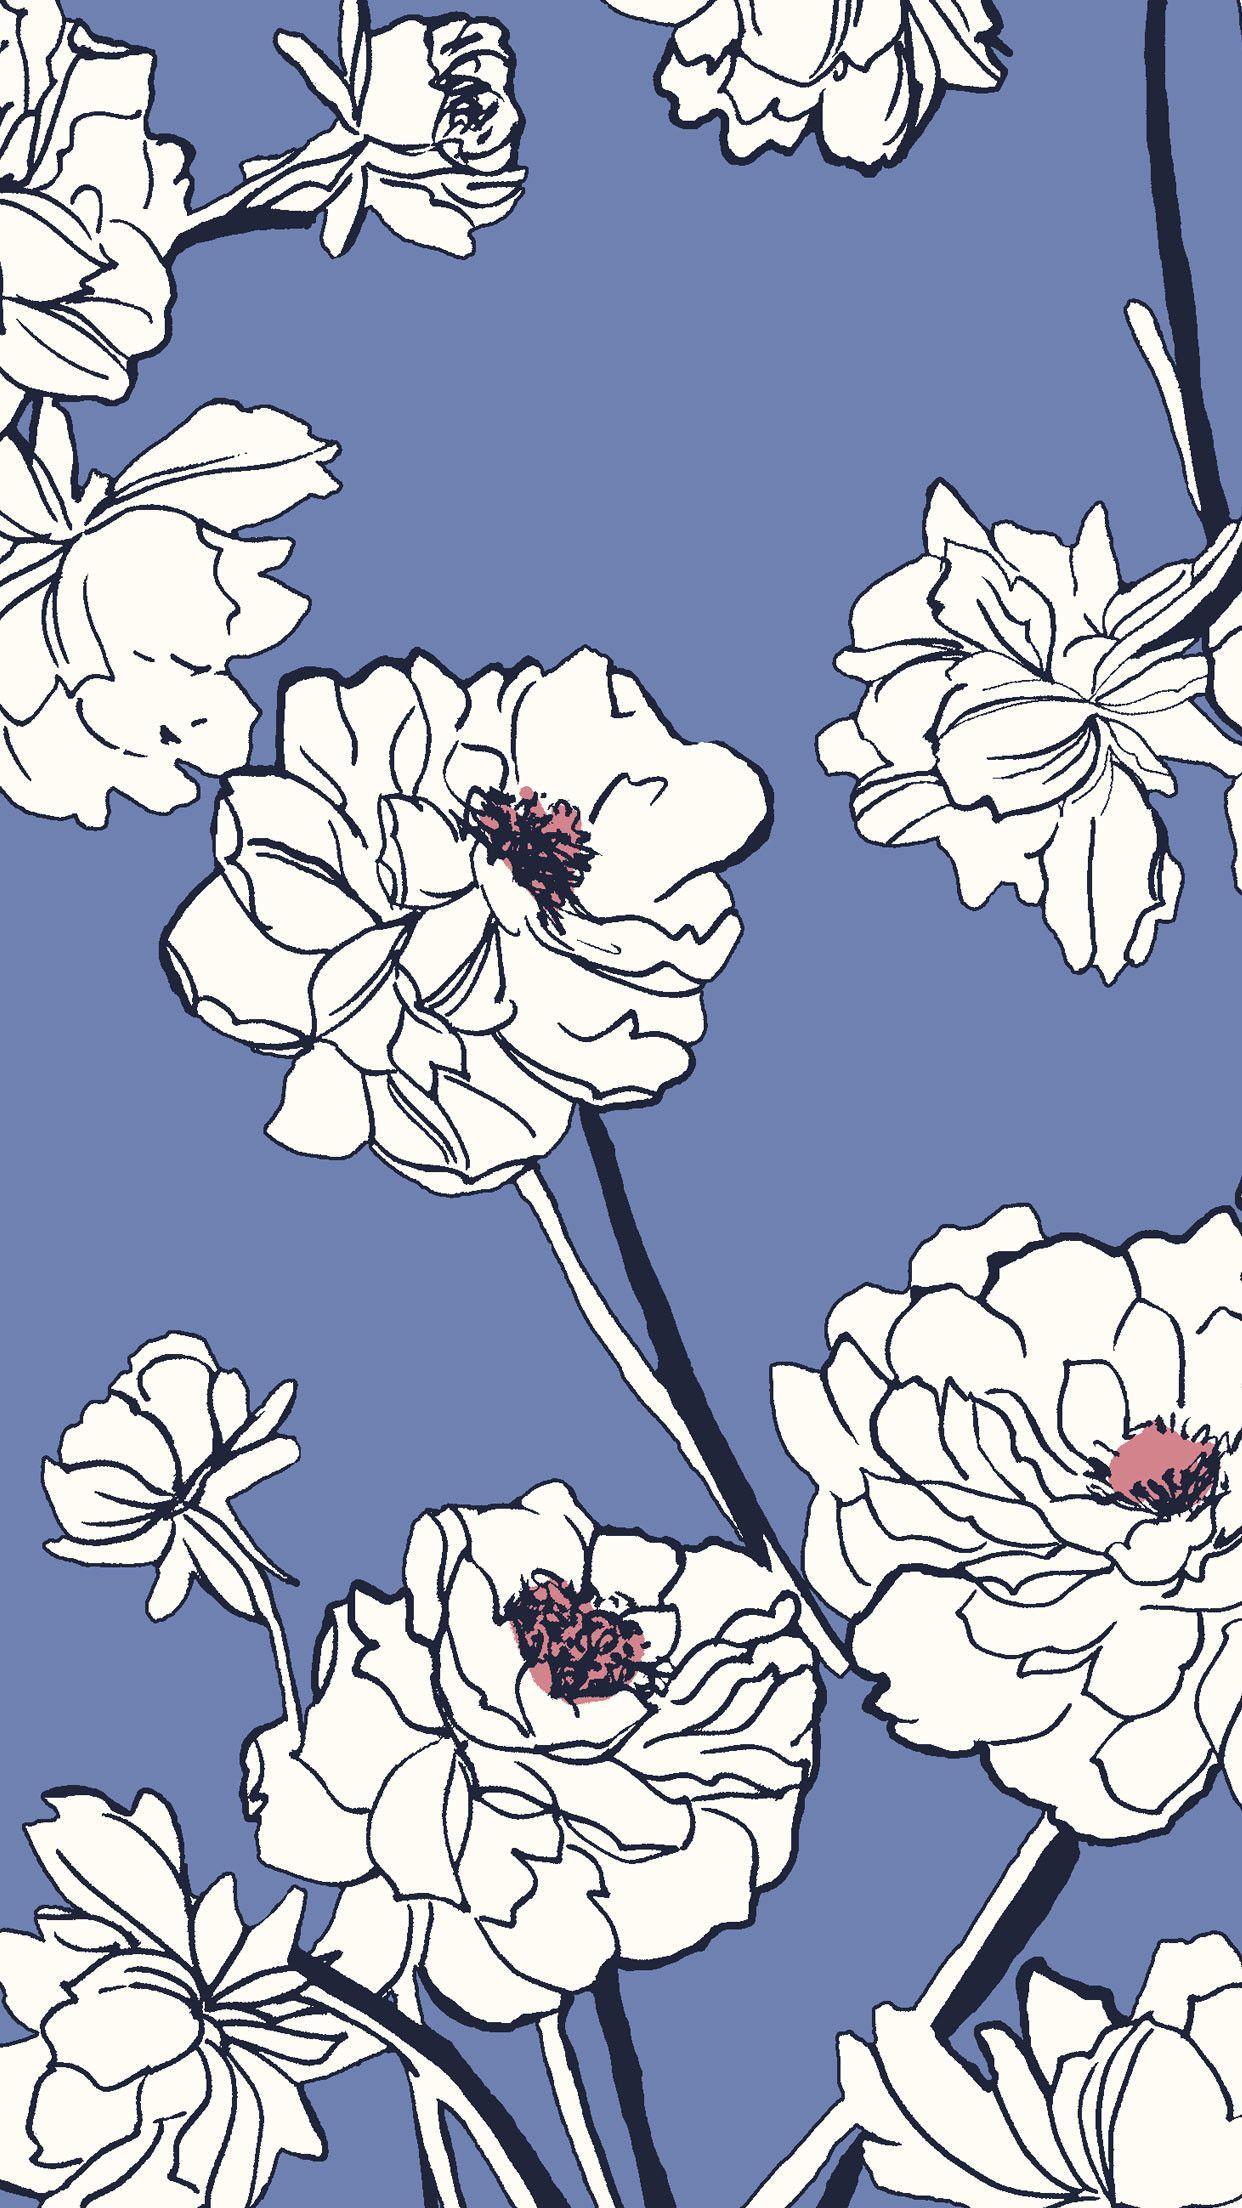 Pastel Kate Spade Desktop Wallpapers - Top Free Pastel ...Kate Spade Pattern Desktop